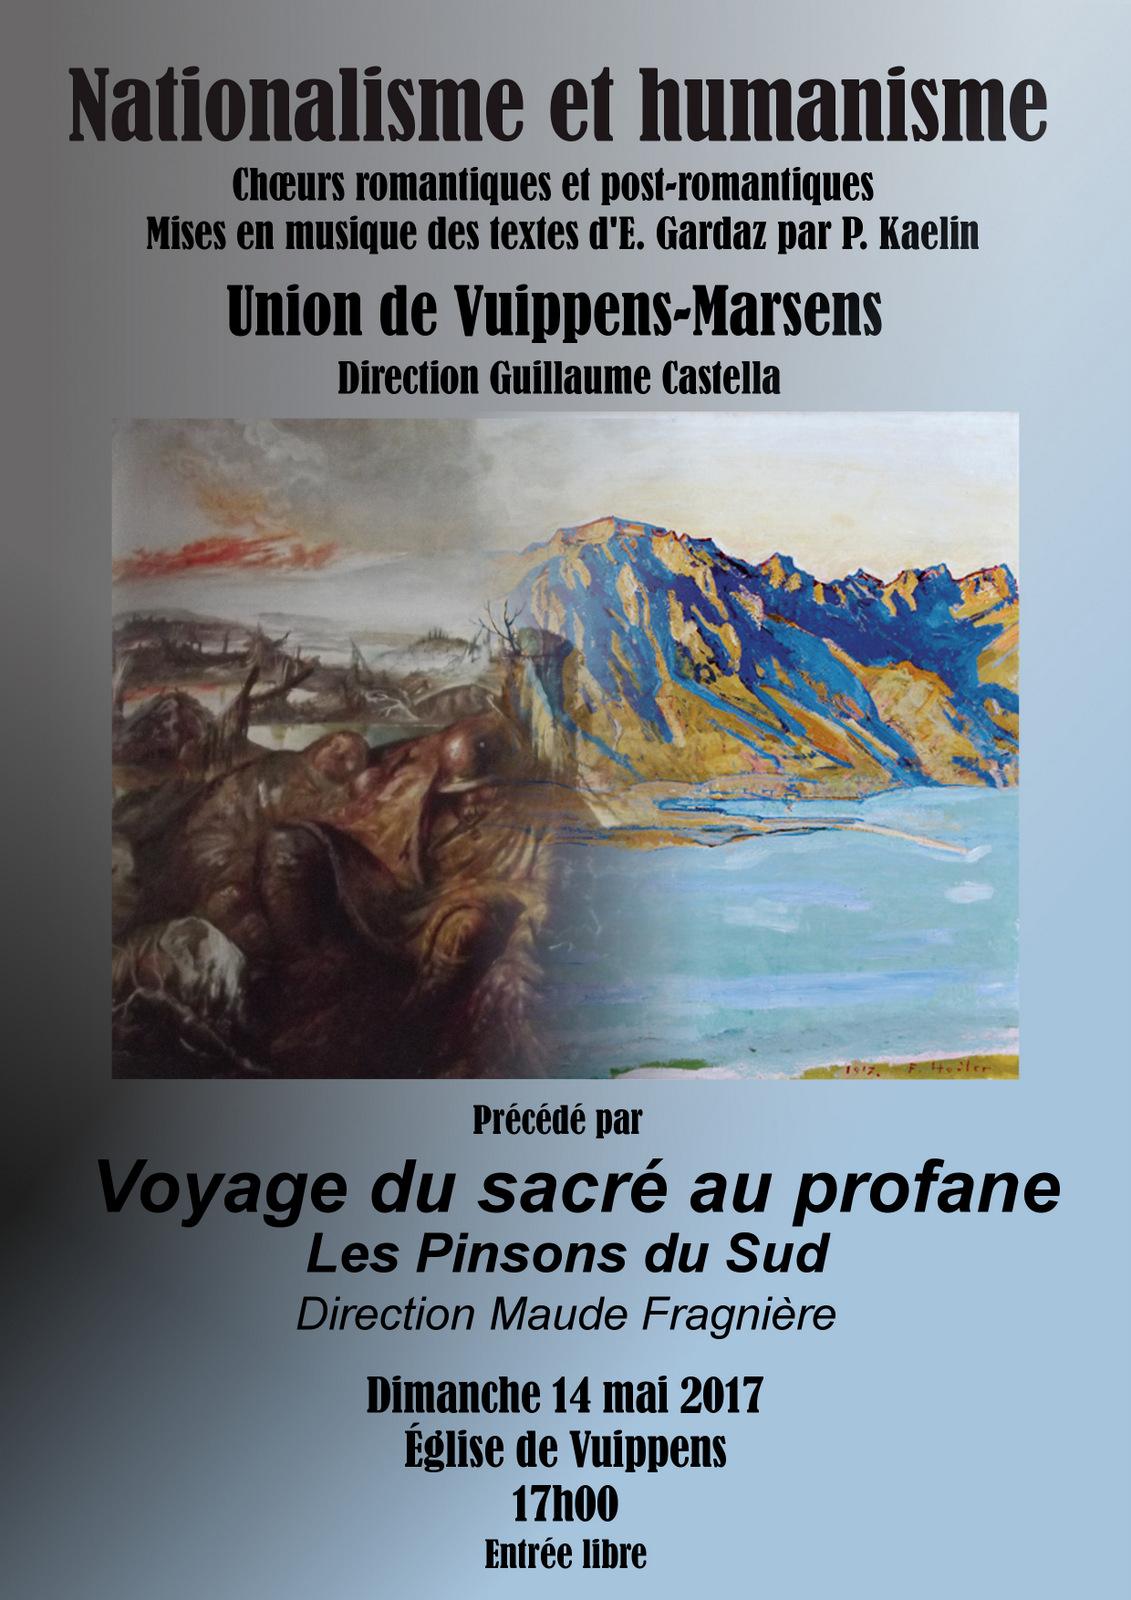 Concert de L' Union Vuippens - Marsens